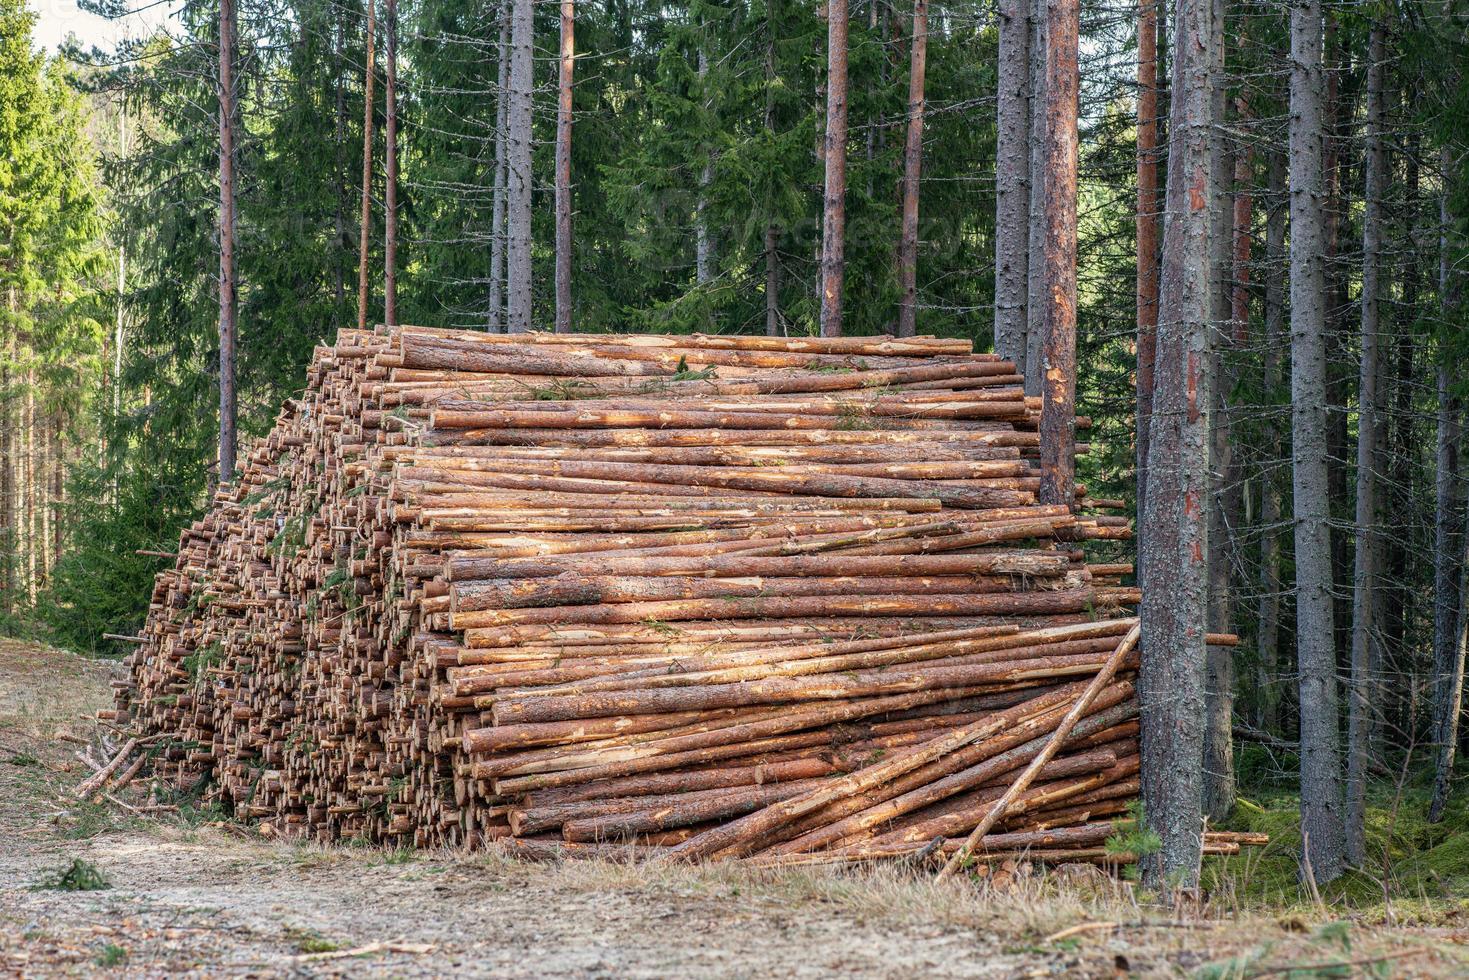 grote stapel dennenhout in een bos foto